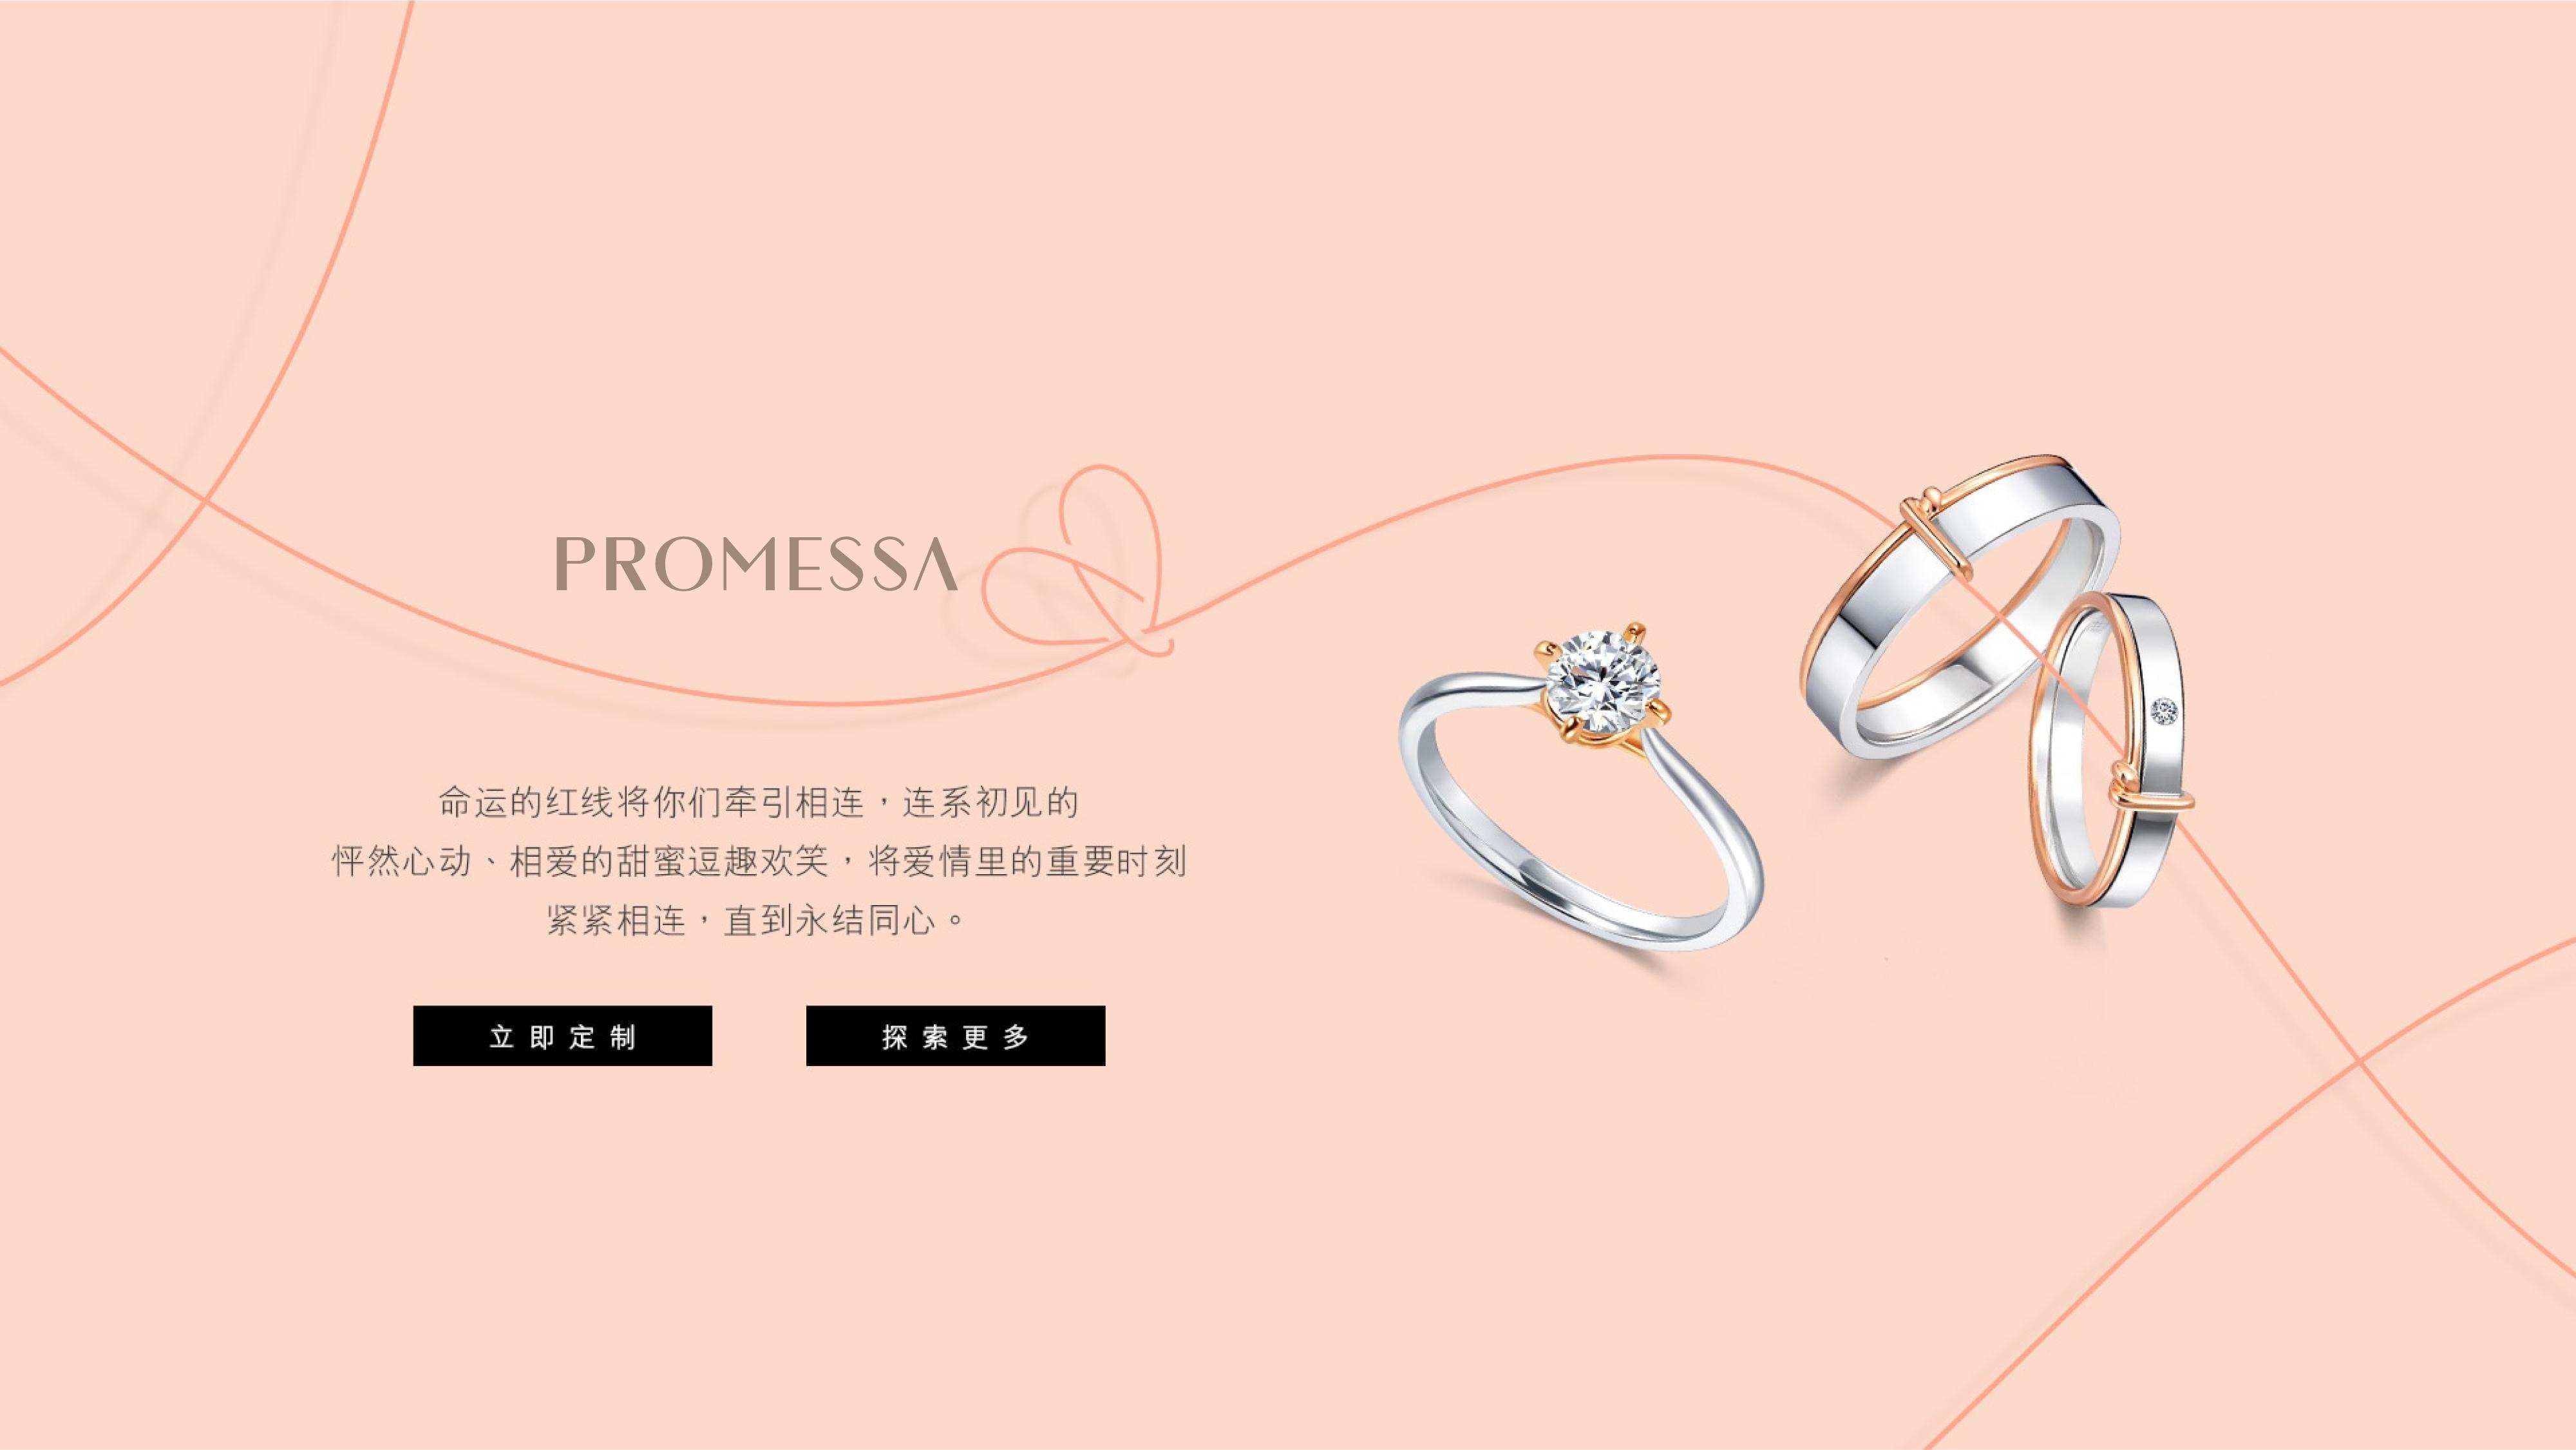 Promessa Duet